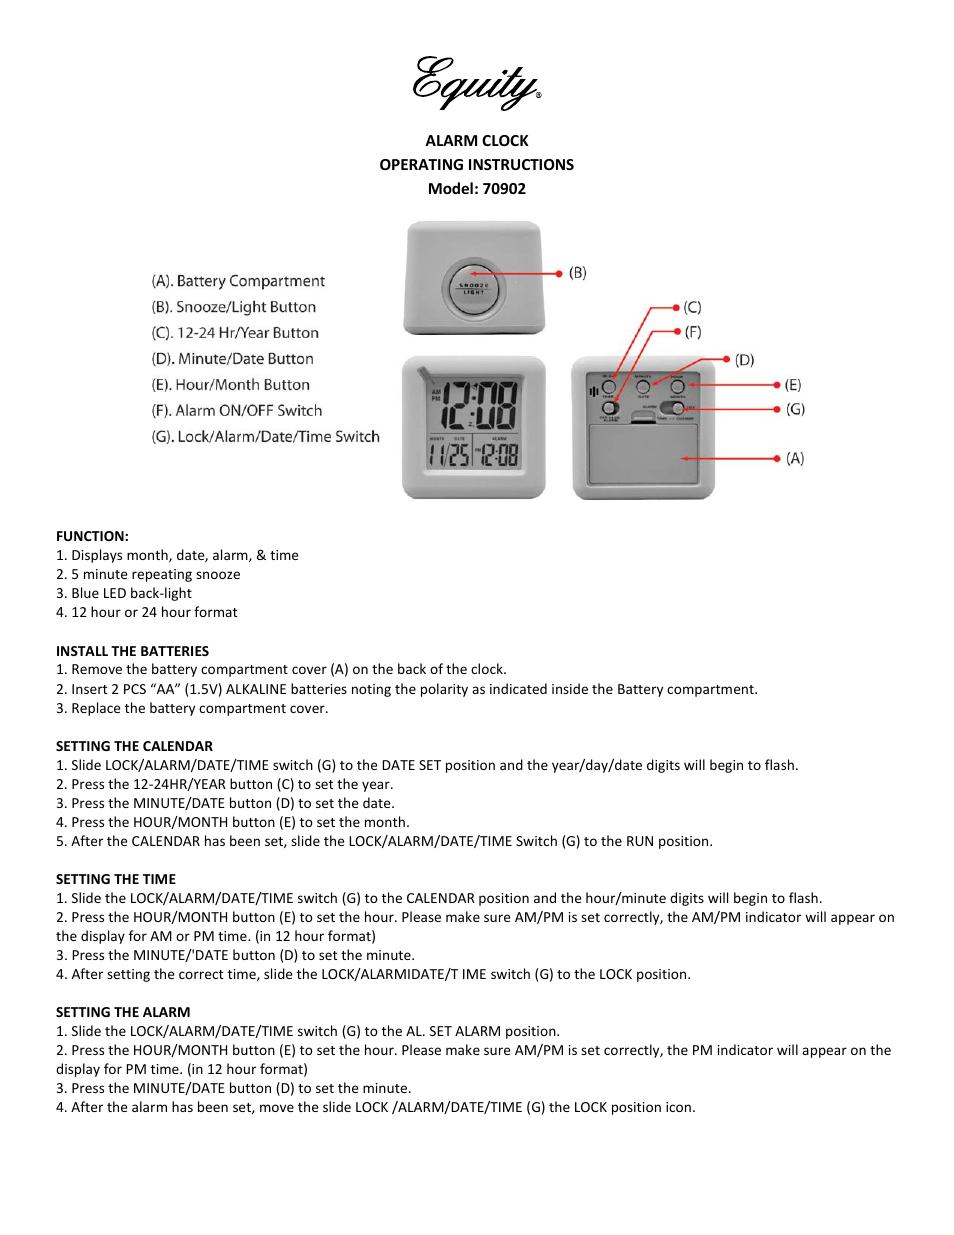 Equity by La Crosse 70902 Soft Cube LCD Alarm Clock User Manual | 2 pages |  Also for: 70910 Soft Cube LCD Alarm Clock, 70911 Soft Cube LCD Alarm Clock,  ...